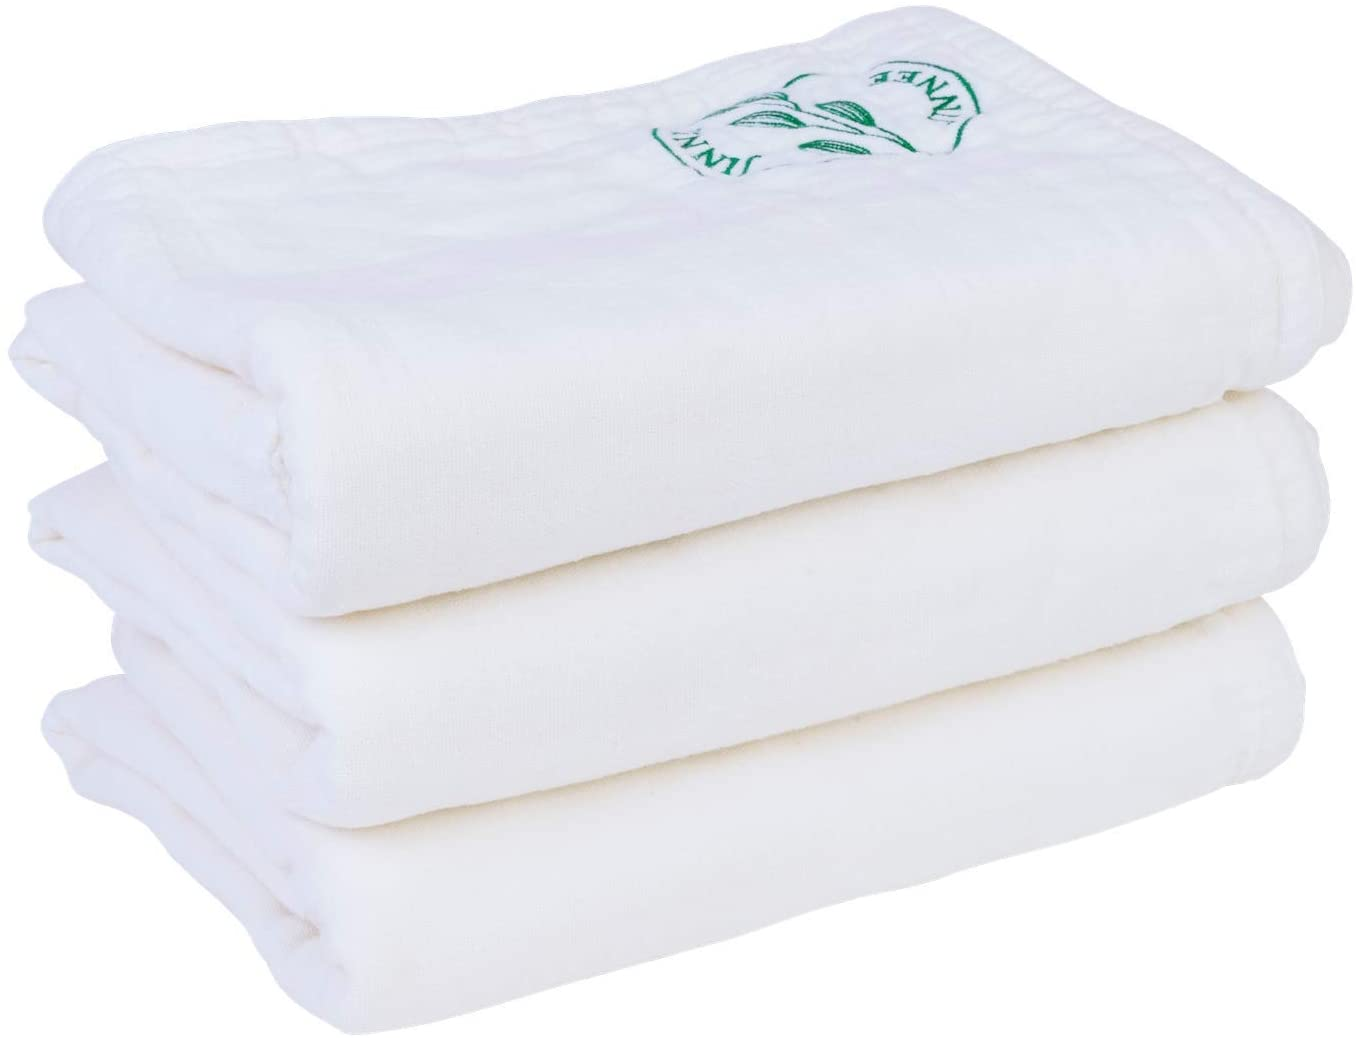 JINNEE Natural Cotton 100% Eco-Friendly South Korea Sochang Towel 3Piece Washcloths